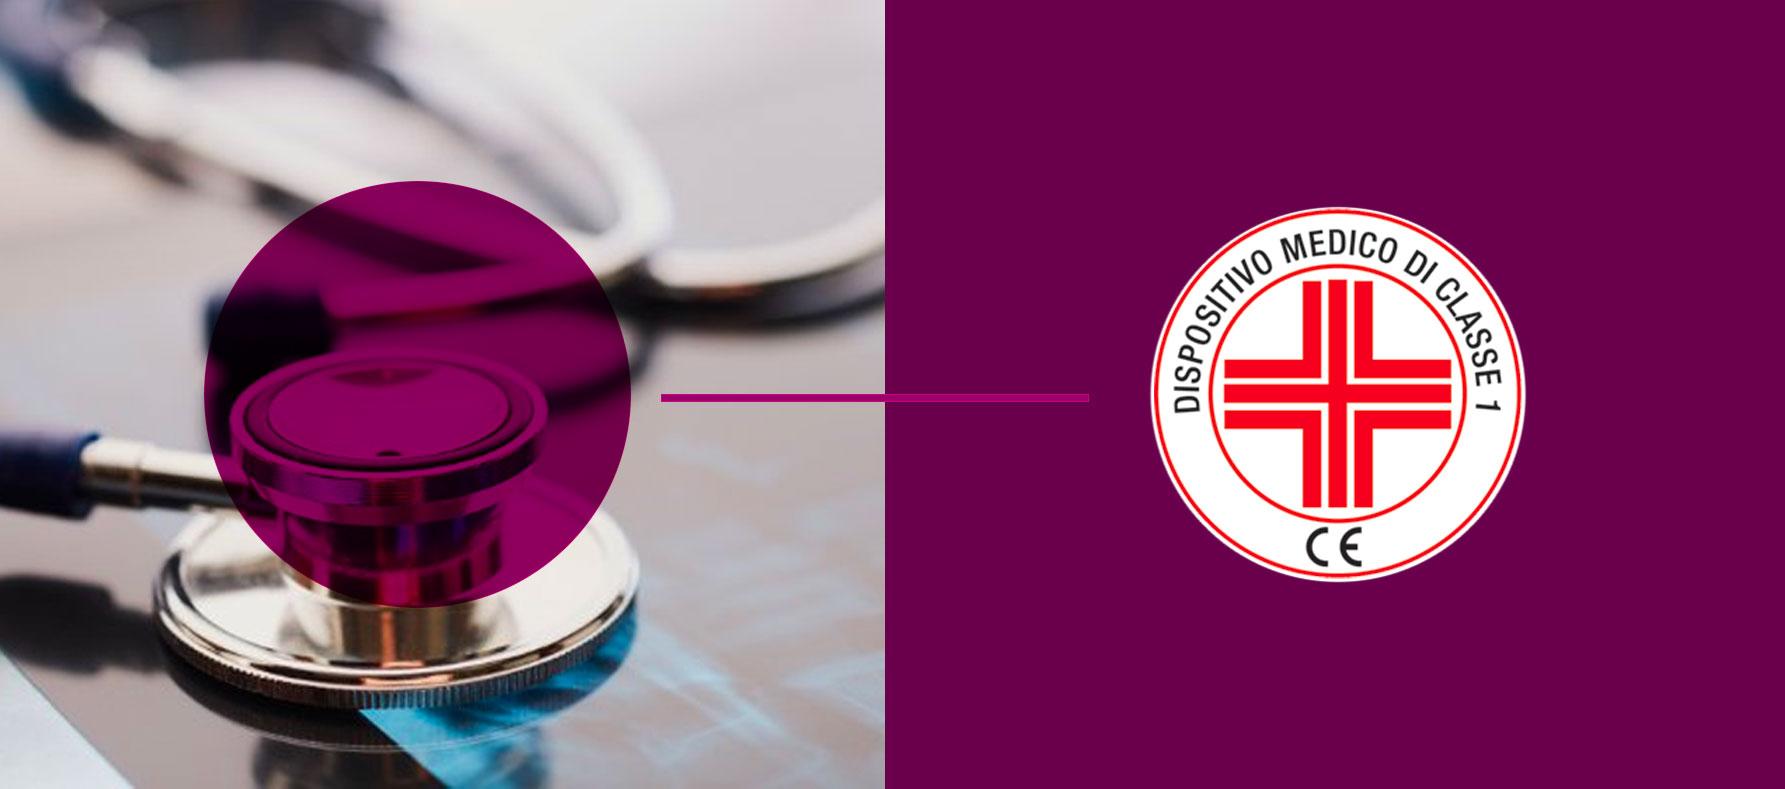 certificazione_dispositivi_medici